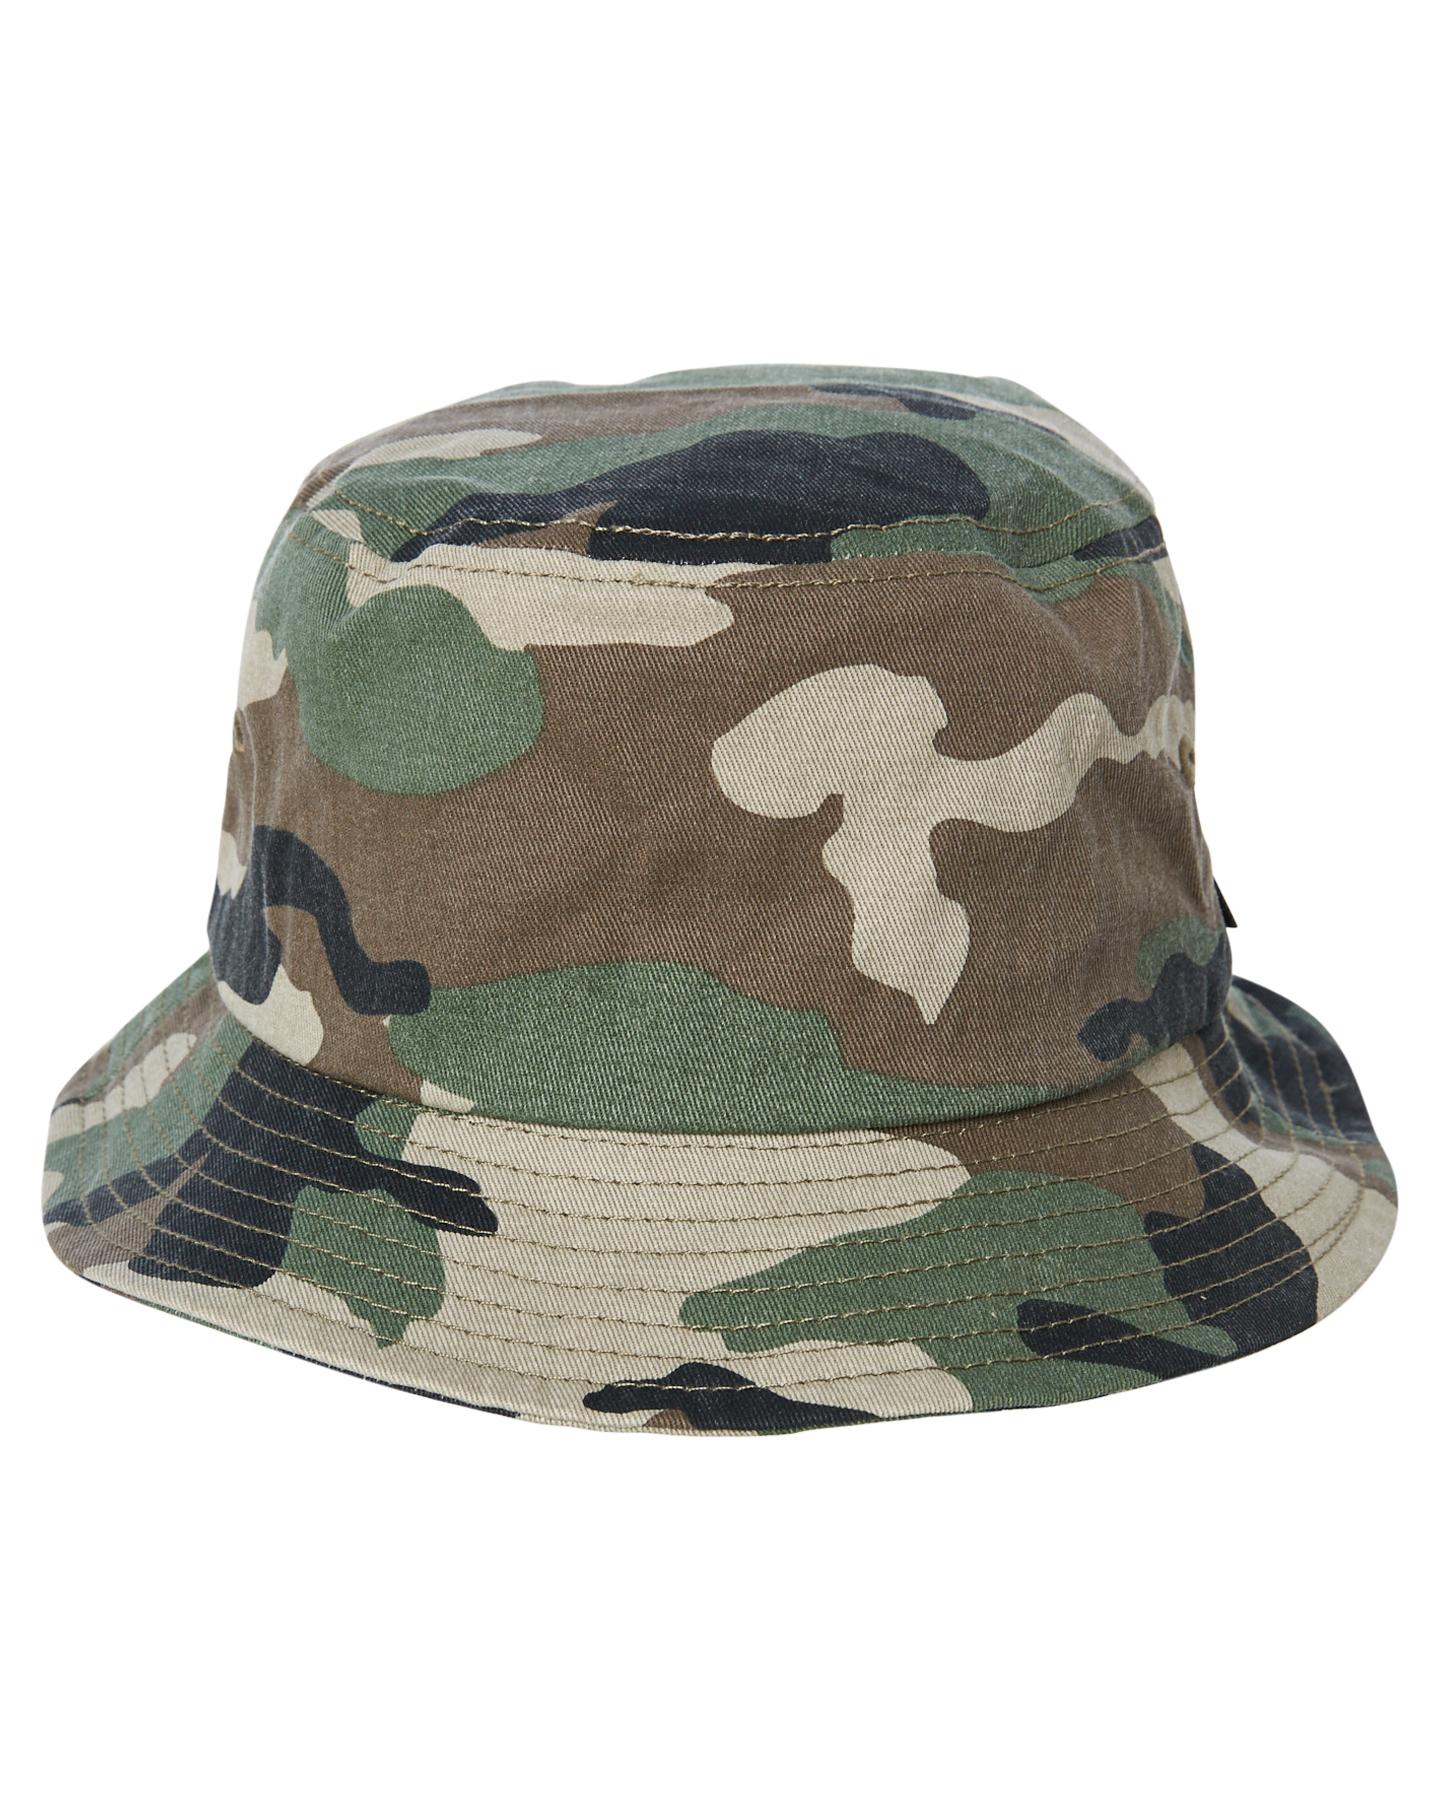 Stussy Men s Graffiti Bucket Hat Cotton Soft 9347385959068  7a29c778879